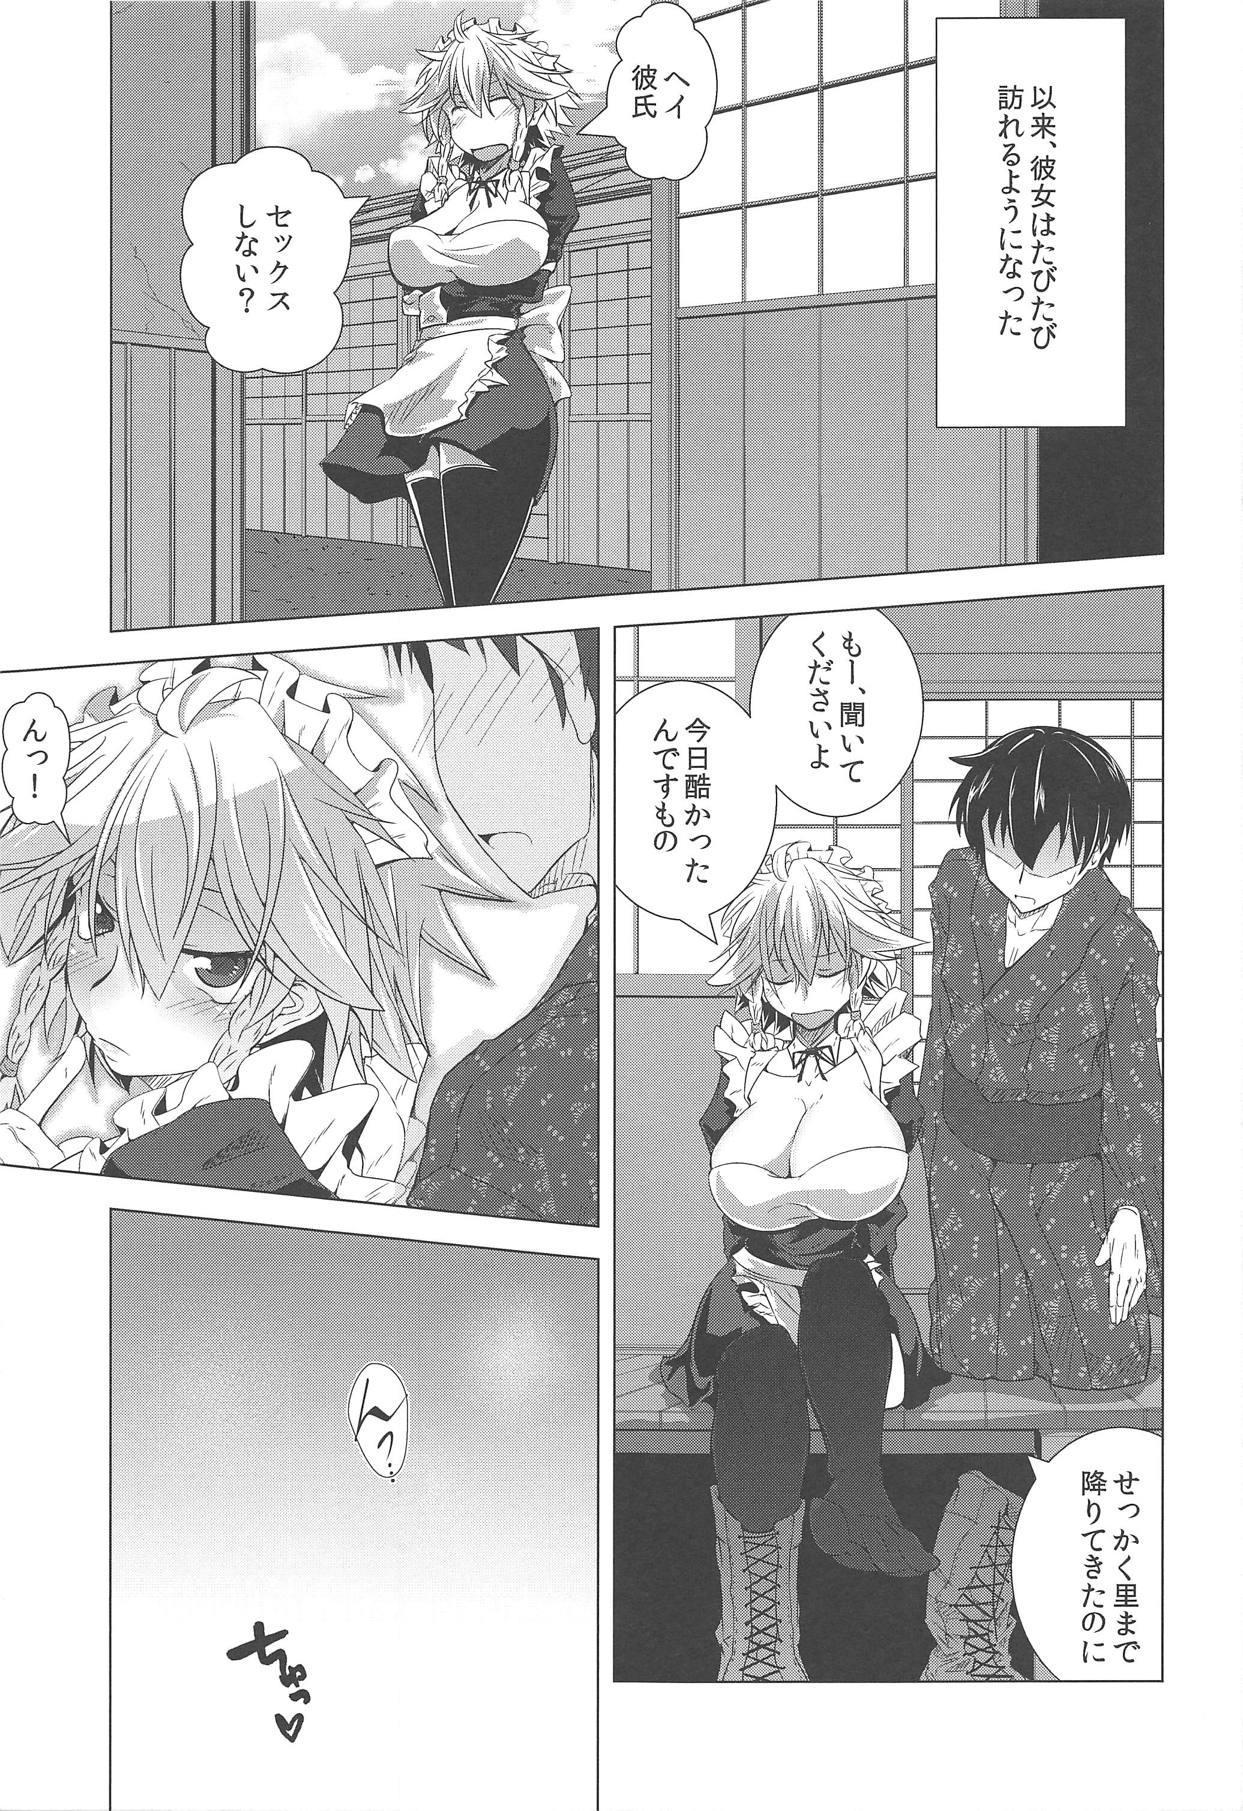 Sakuya-san to SeFriex 11